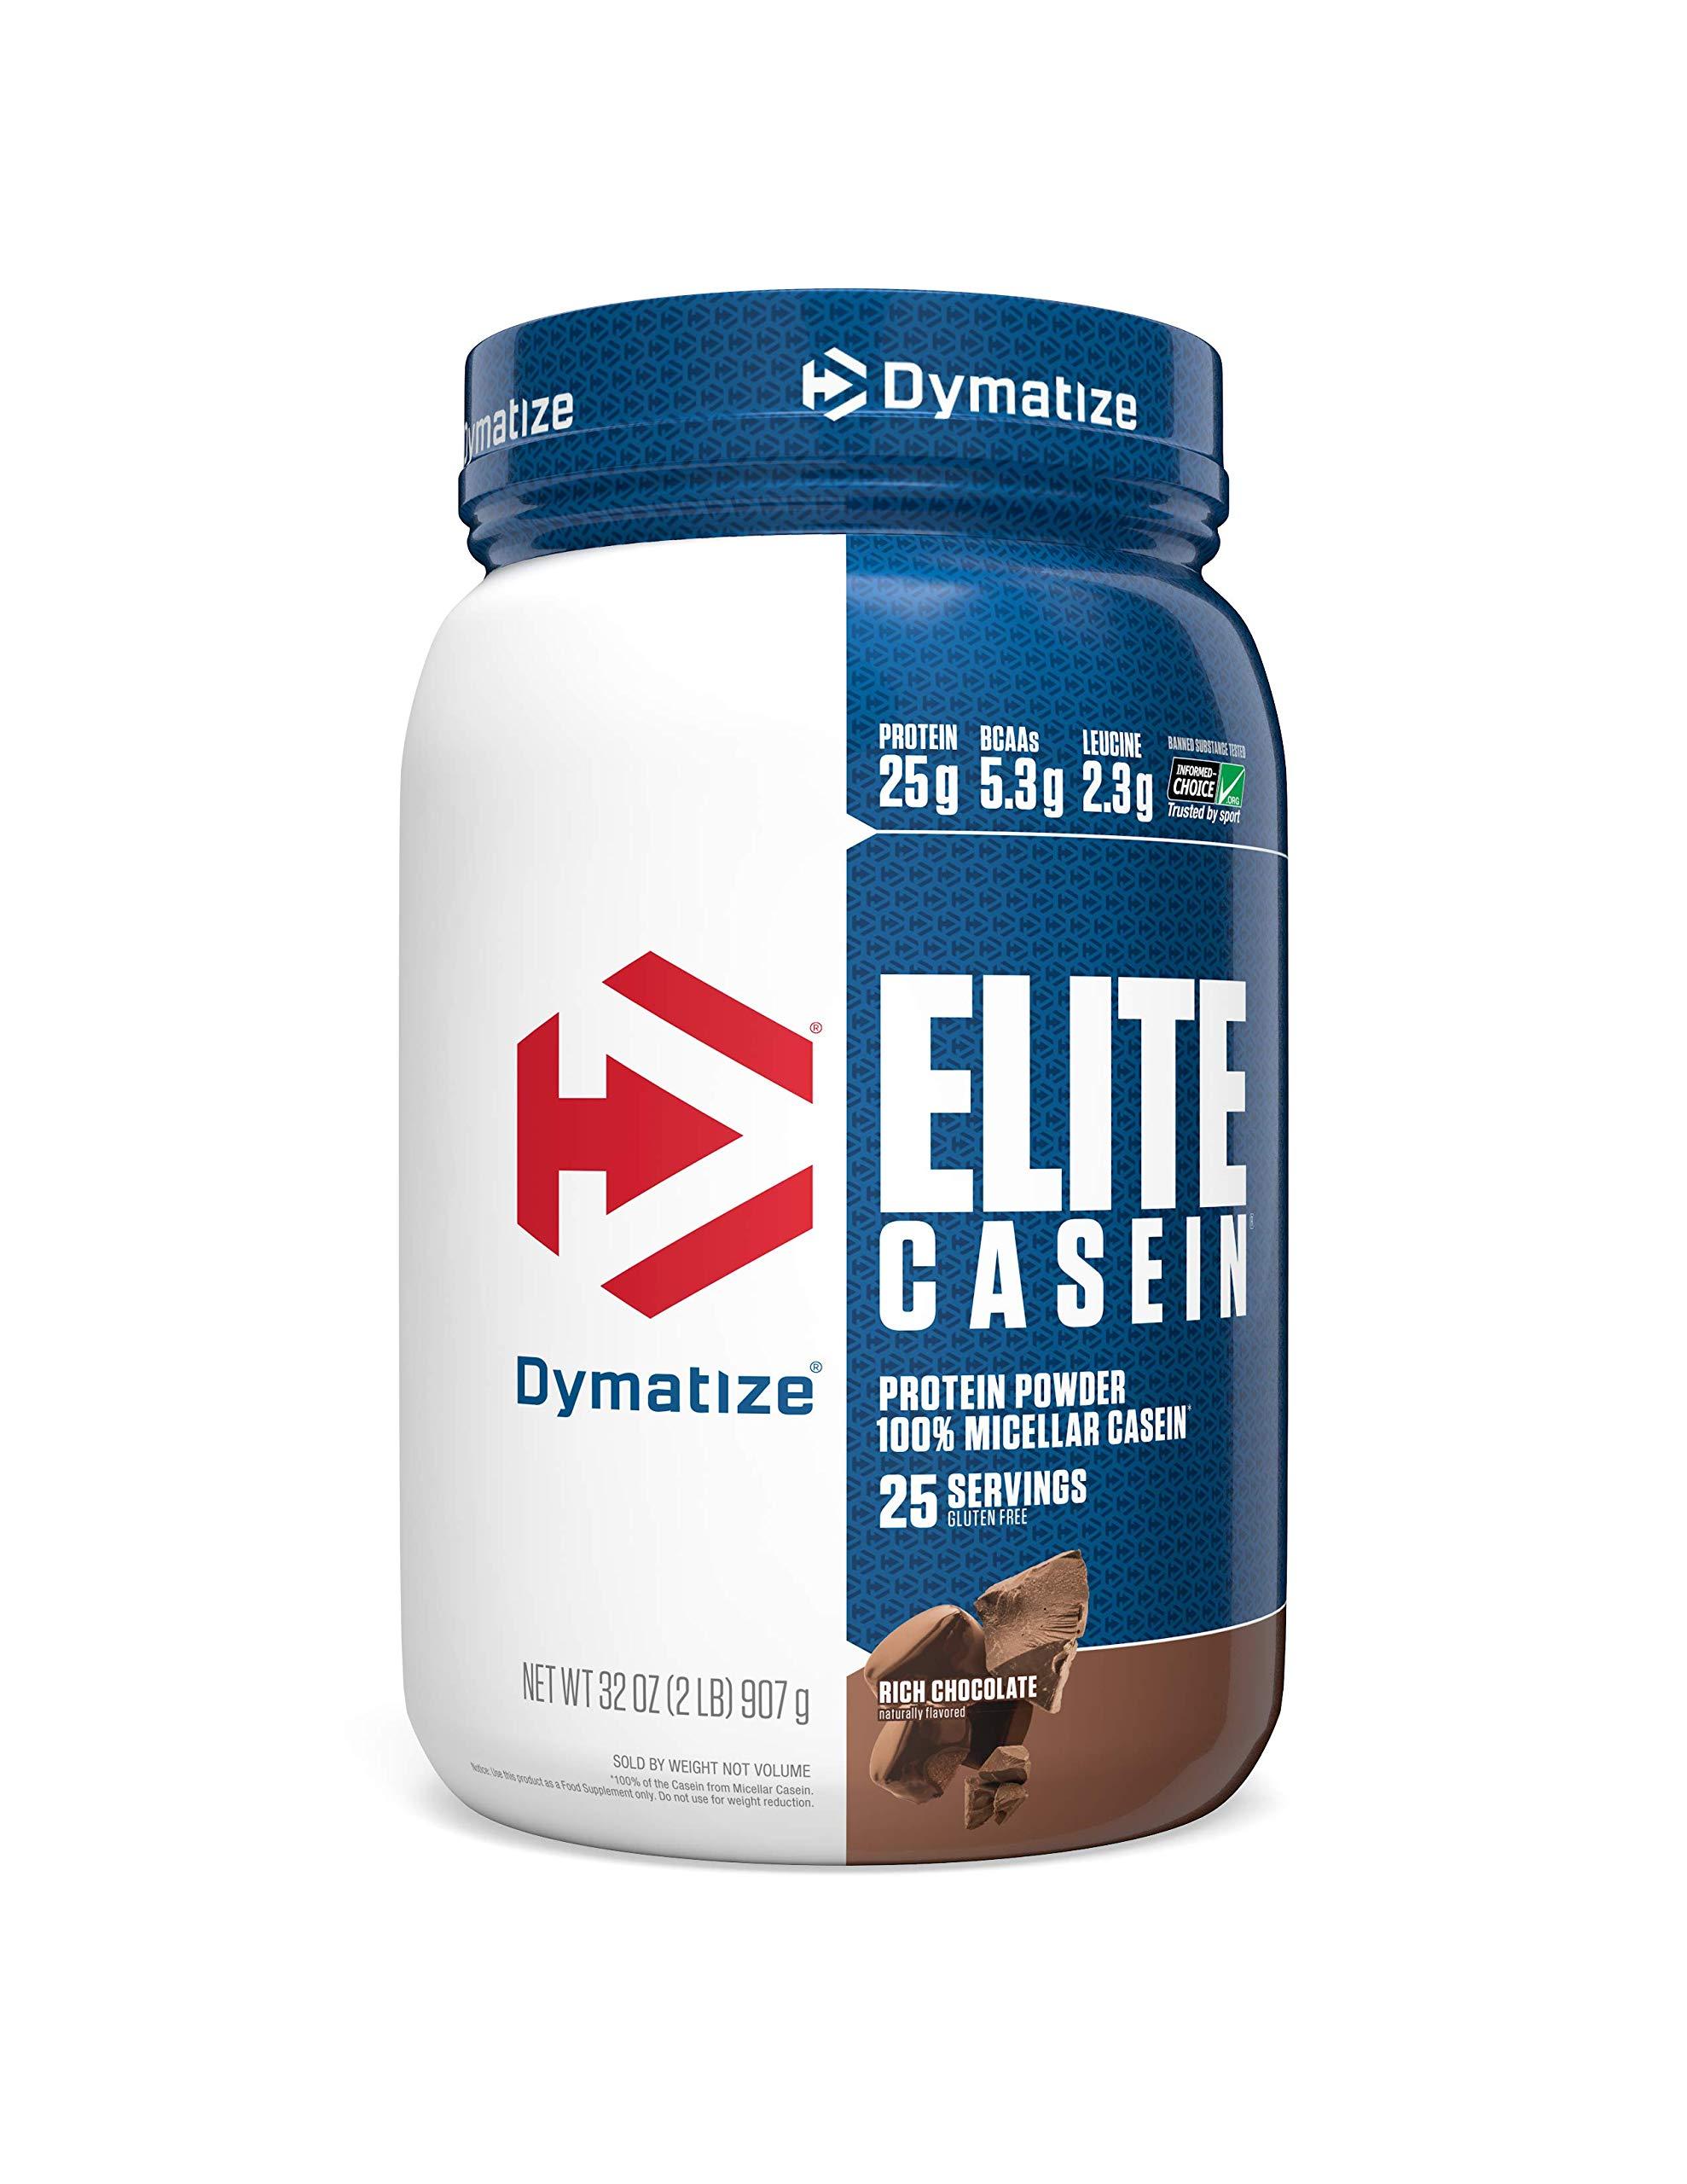 Dymatize Elite Casein Protein Powder